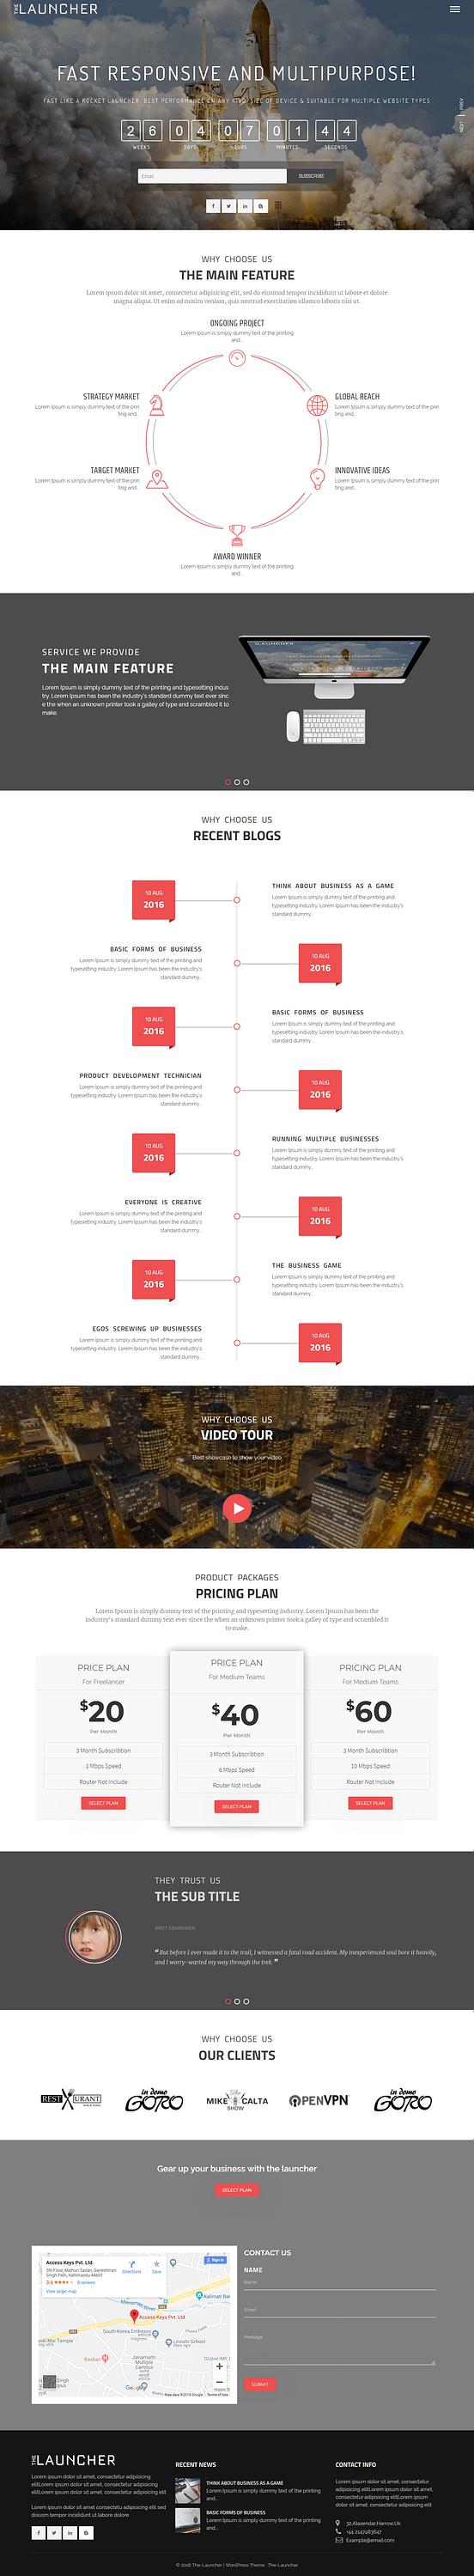 The Launcher - Best Free Multipurpose WordPress Theme